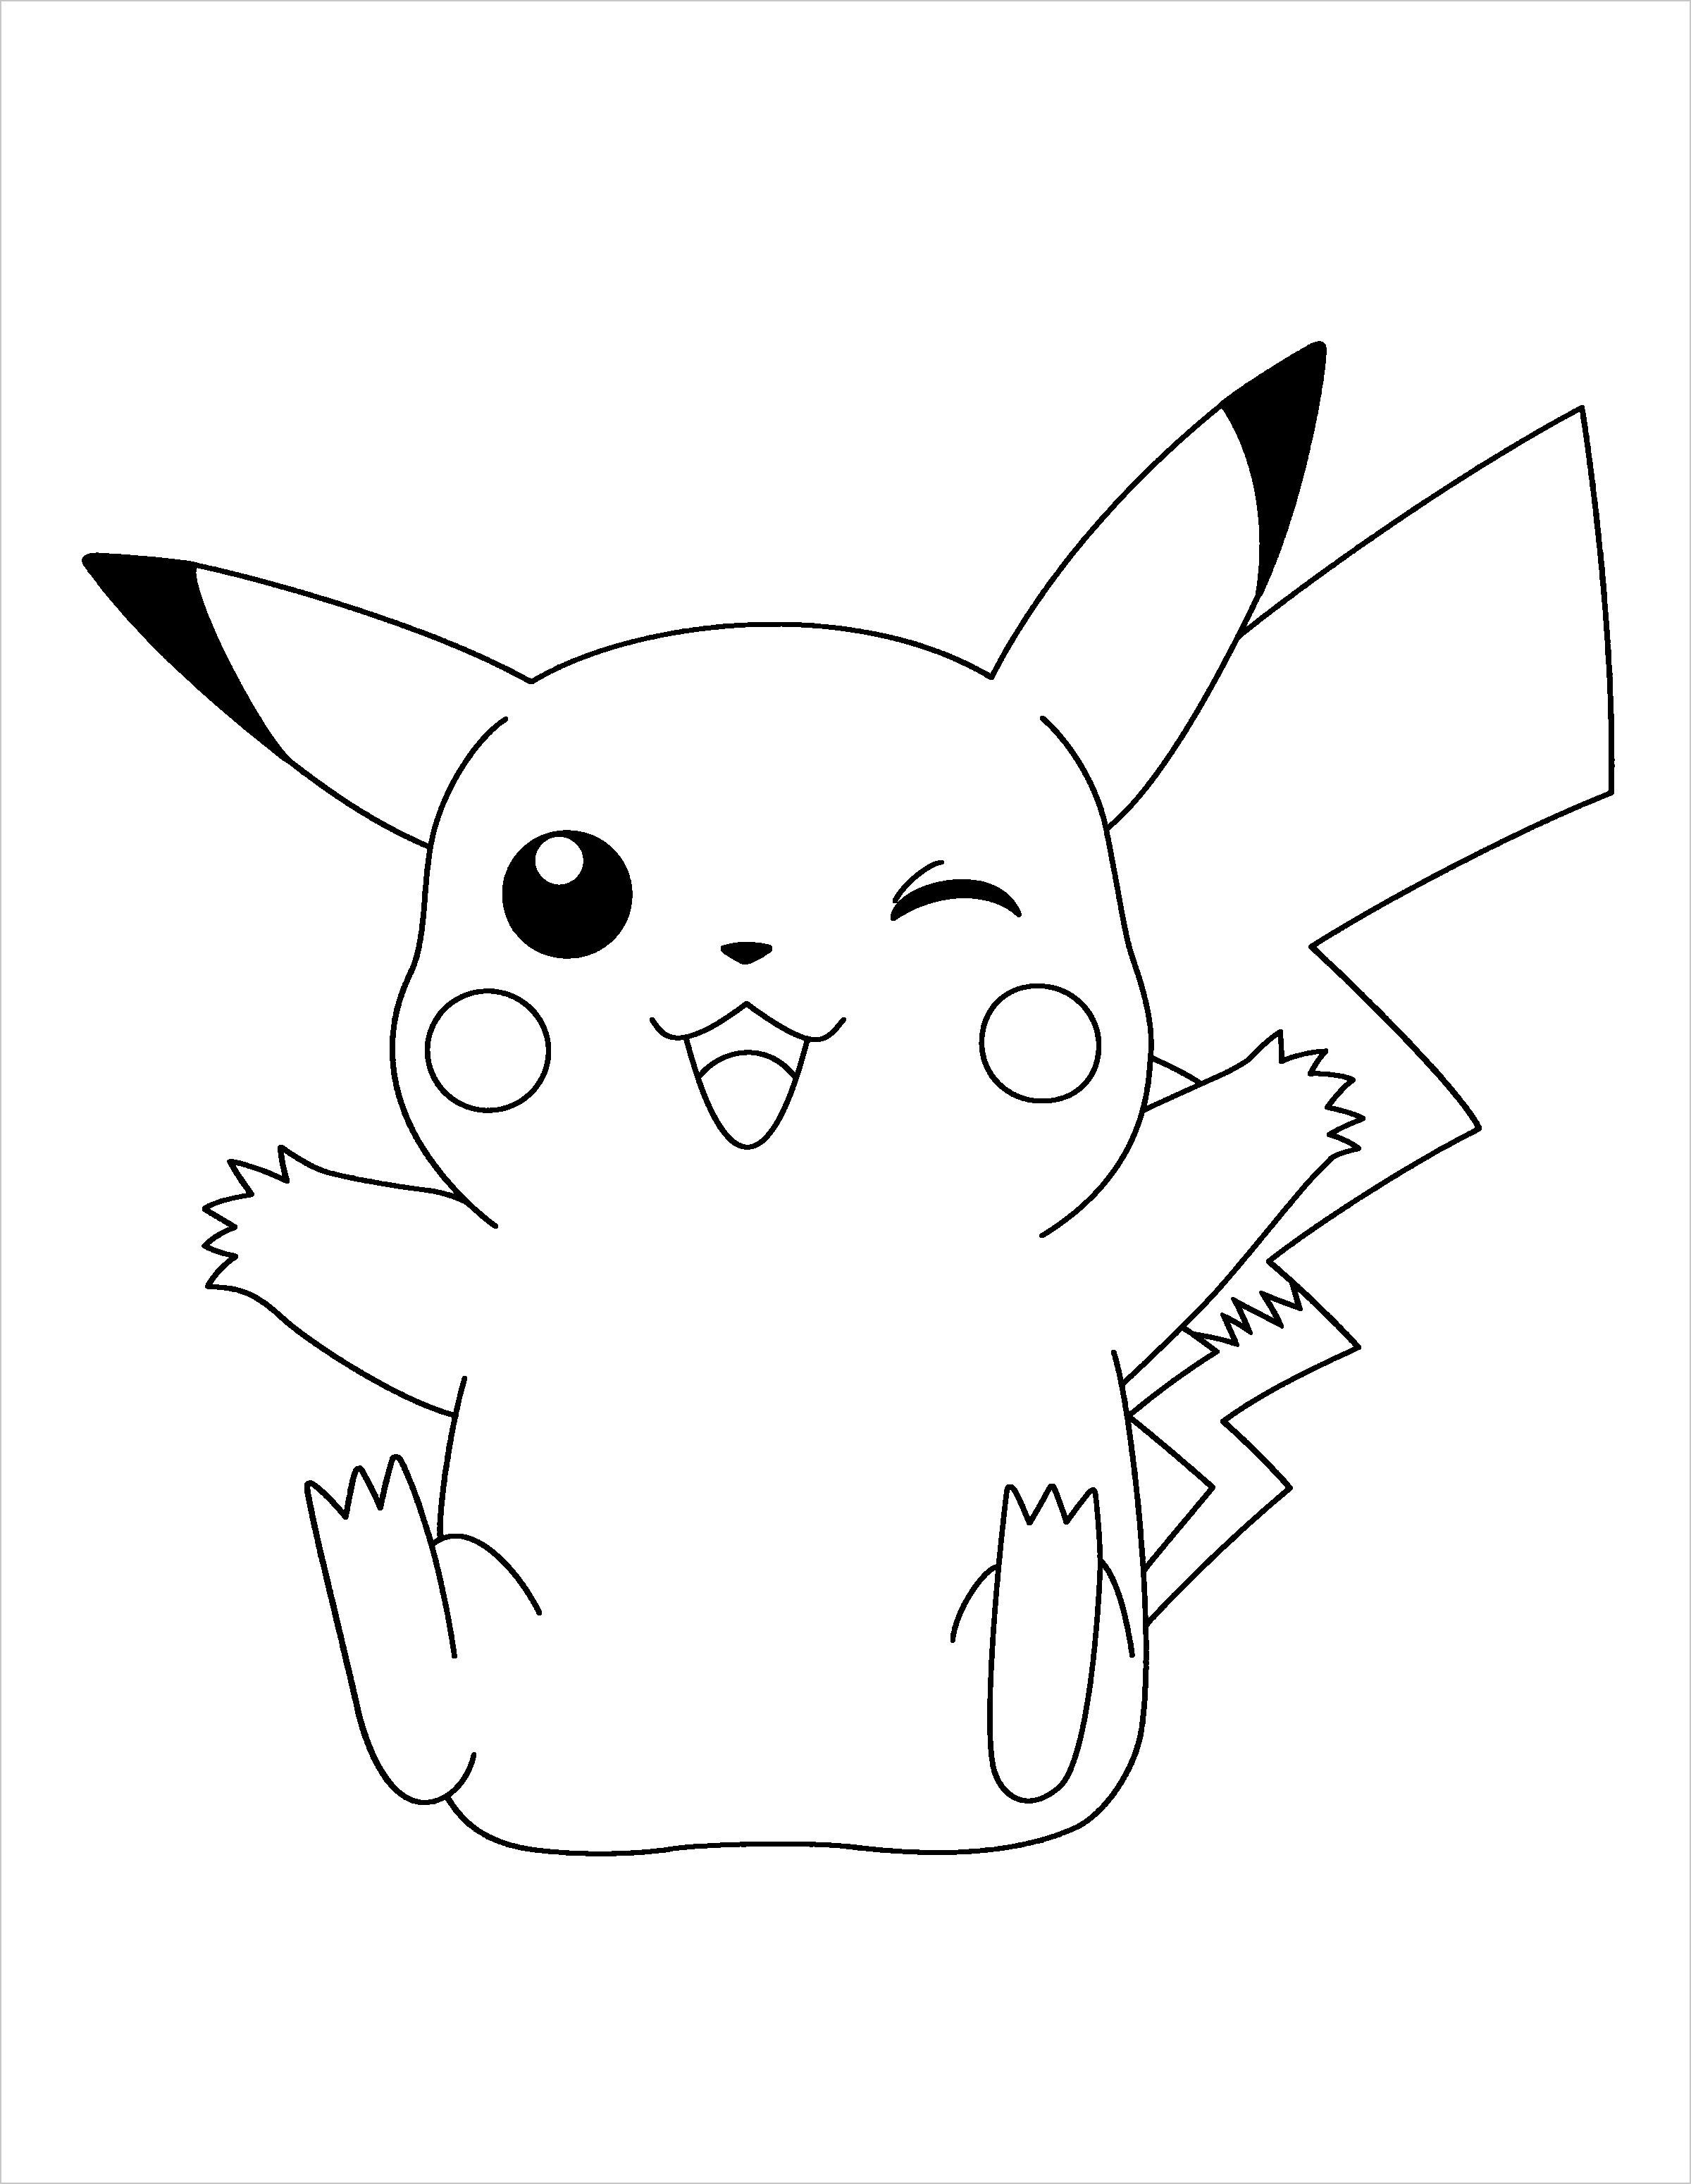 Ausmalbilder Pokemon Quajutsu Neu Halt Pokemon Ausmalbilder Mega Entwicklung Citadingue Bild